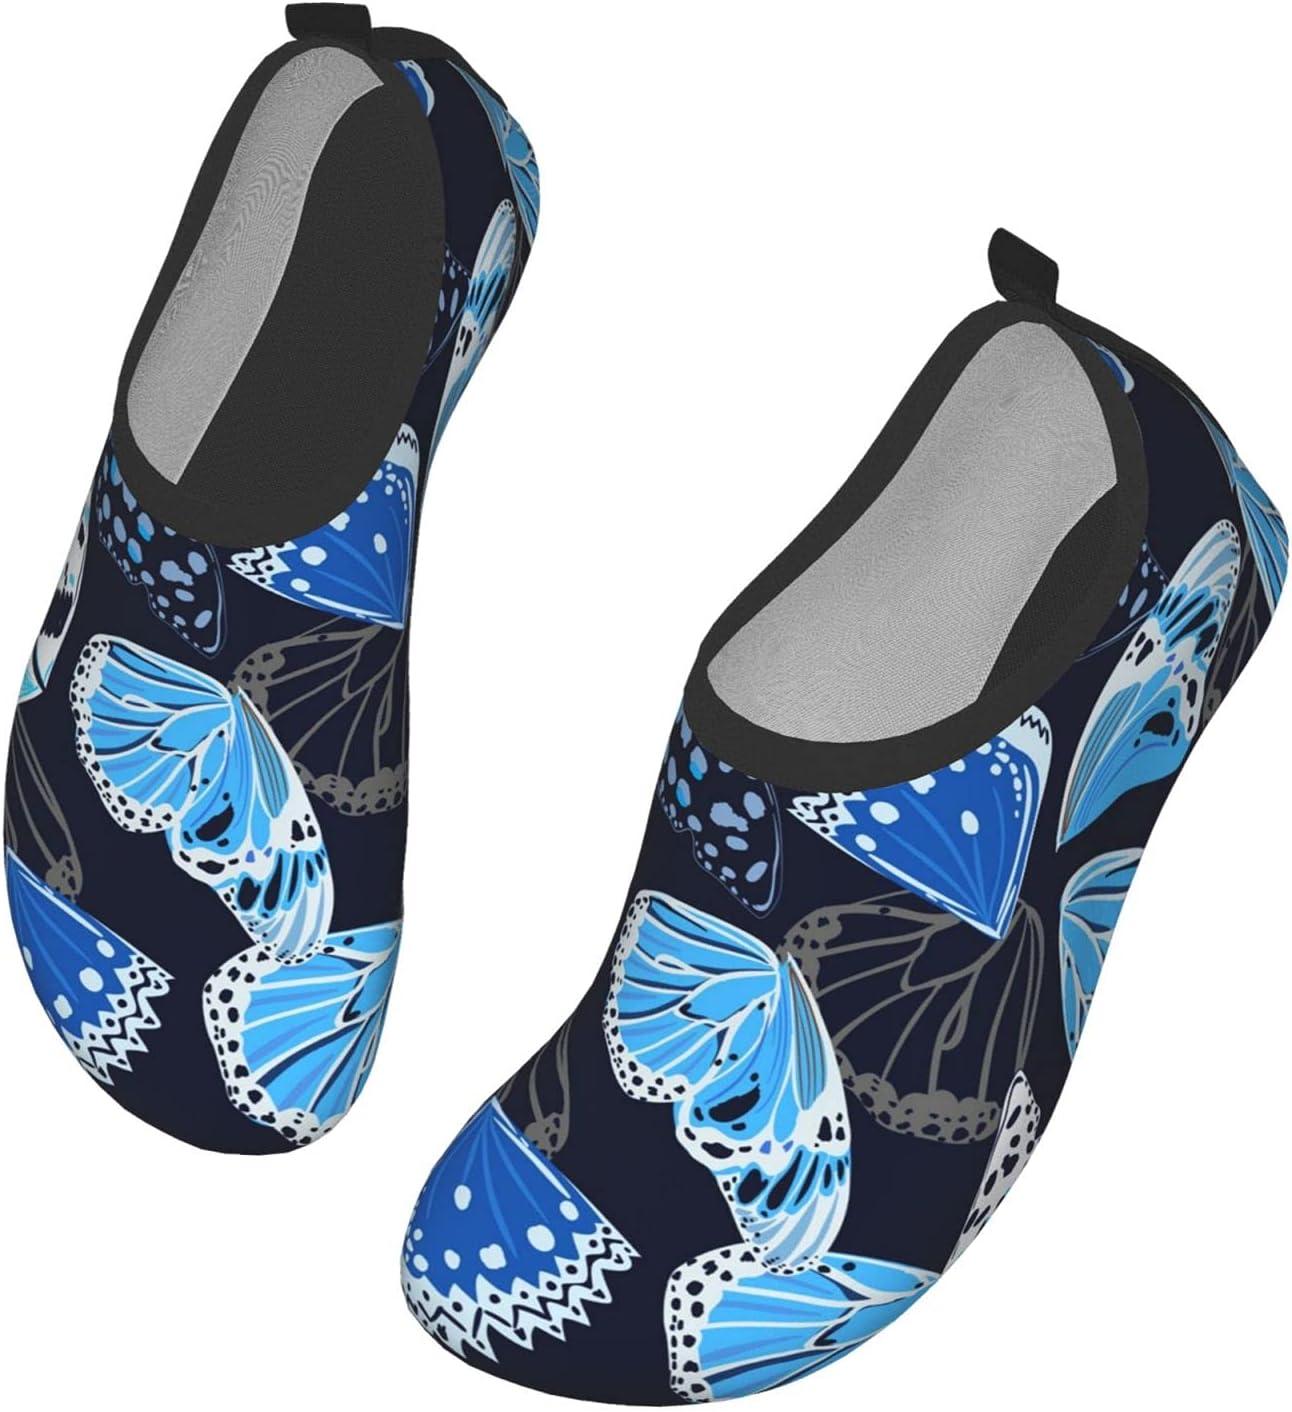 NA Blue Petal Pattern Men's Women's Water Shoes Barefoot Quick Dry Slip-On Aqua Socks for Yoga Beach Sports Swim Surf